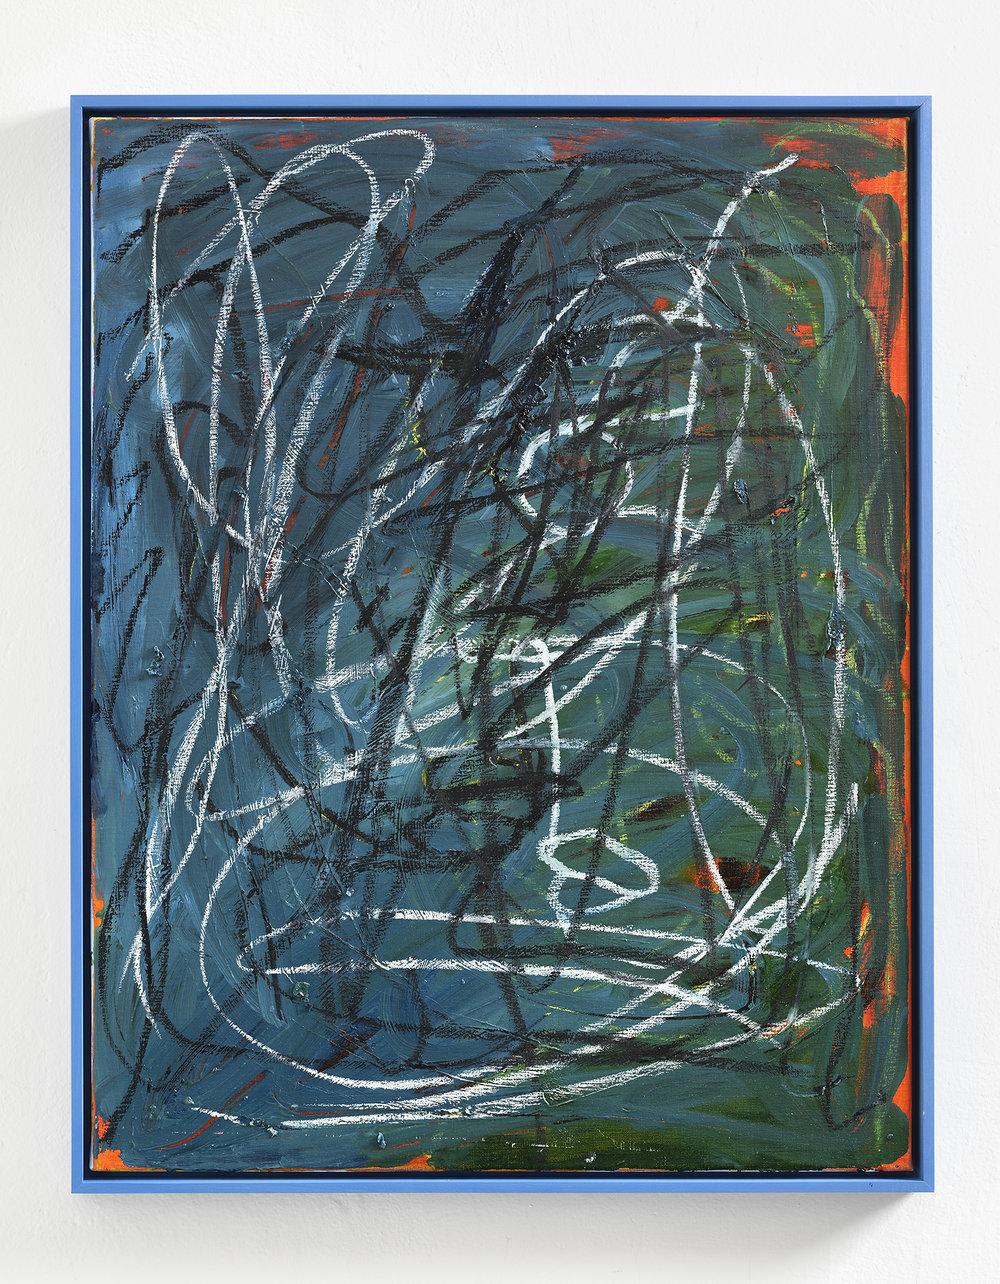 Martin Lukáč  Elaborate Pirate , 2018, Oil and oil-stick on canvas, 90 x 70 cm